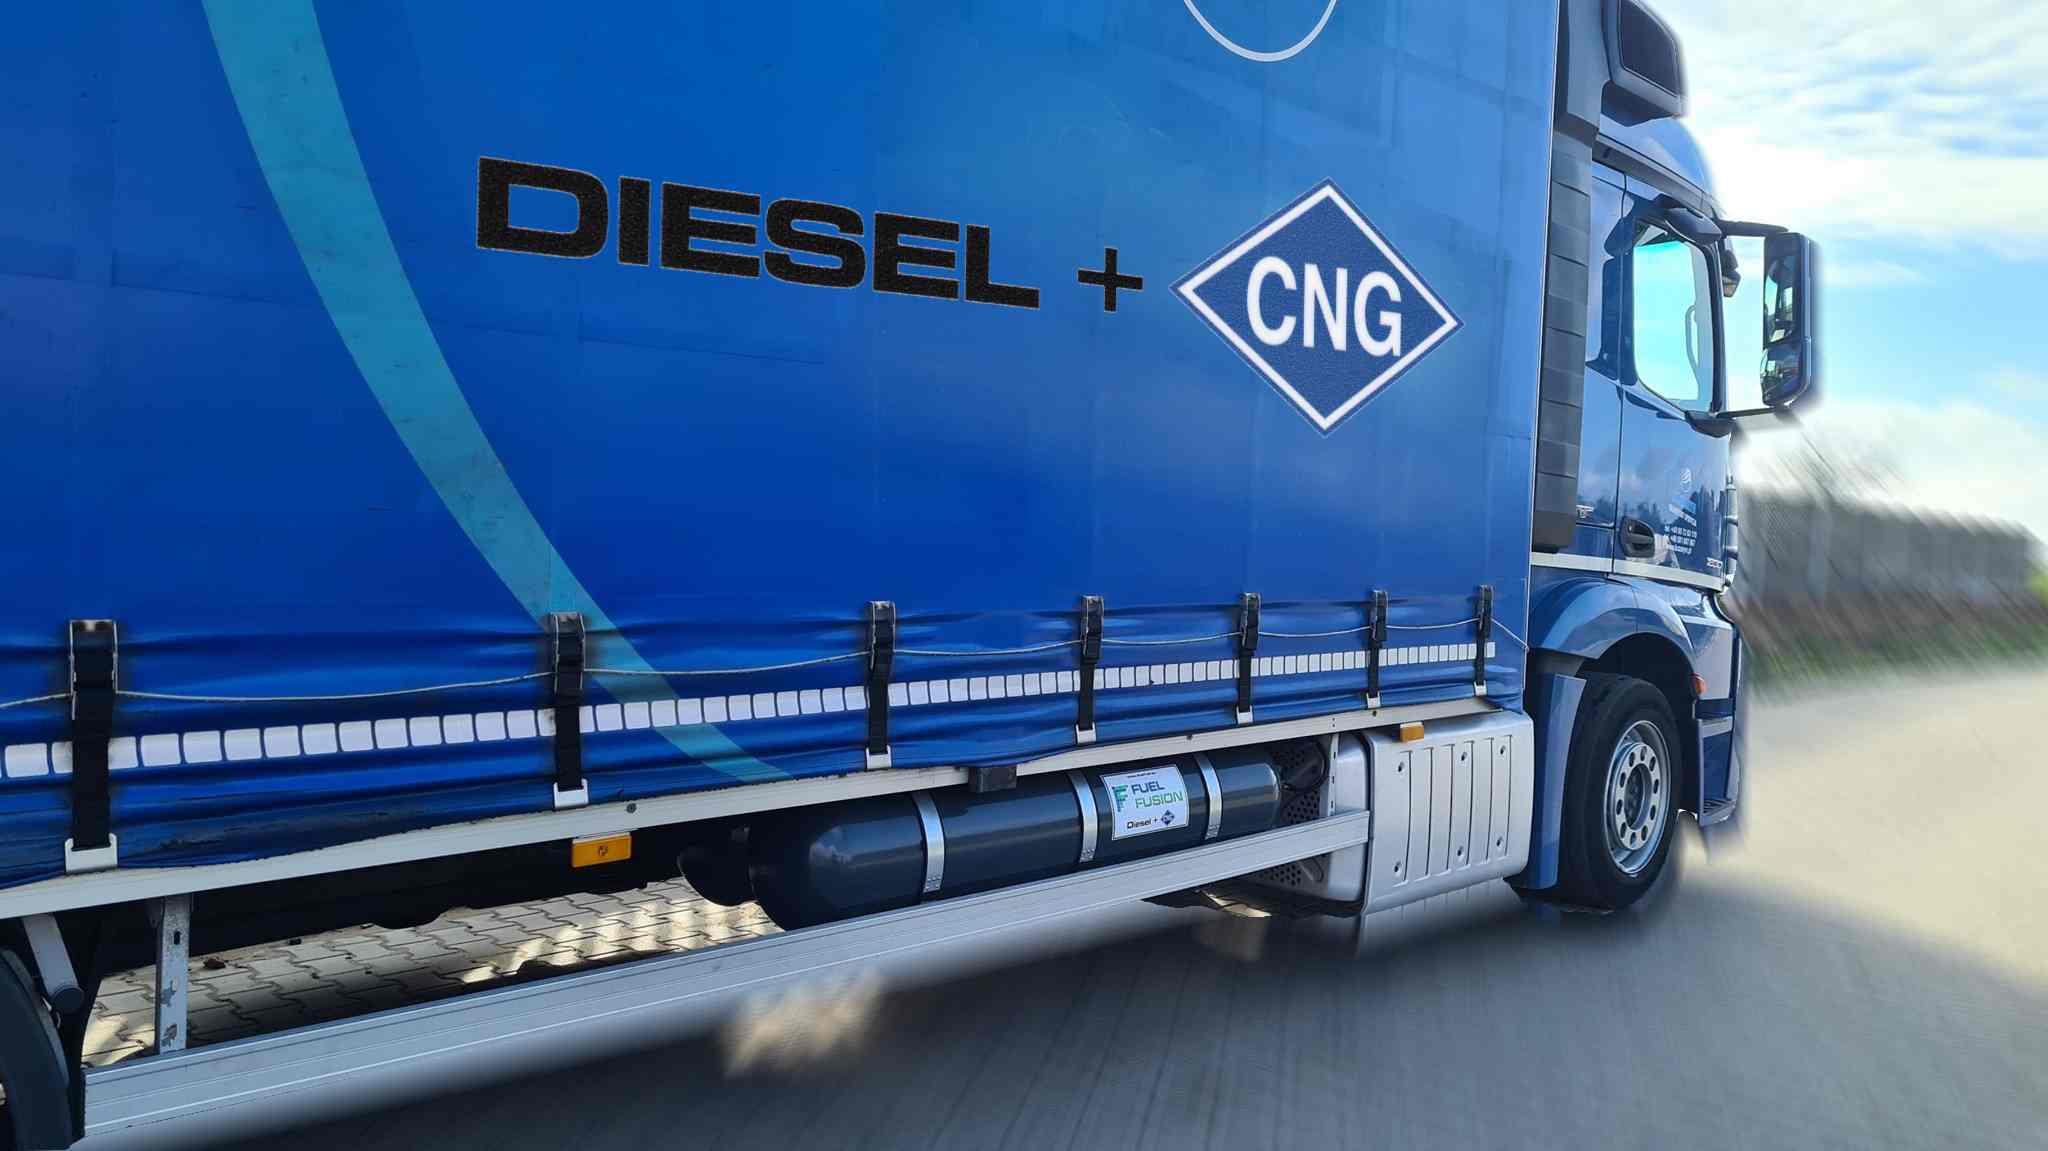 Mercedes Actros 1830L Euro 6 valník Diesel CNG s nádržemi CNG 2x155litrů